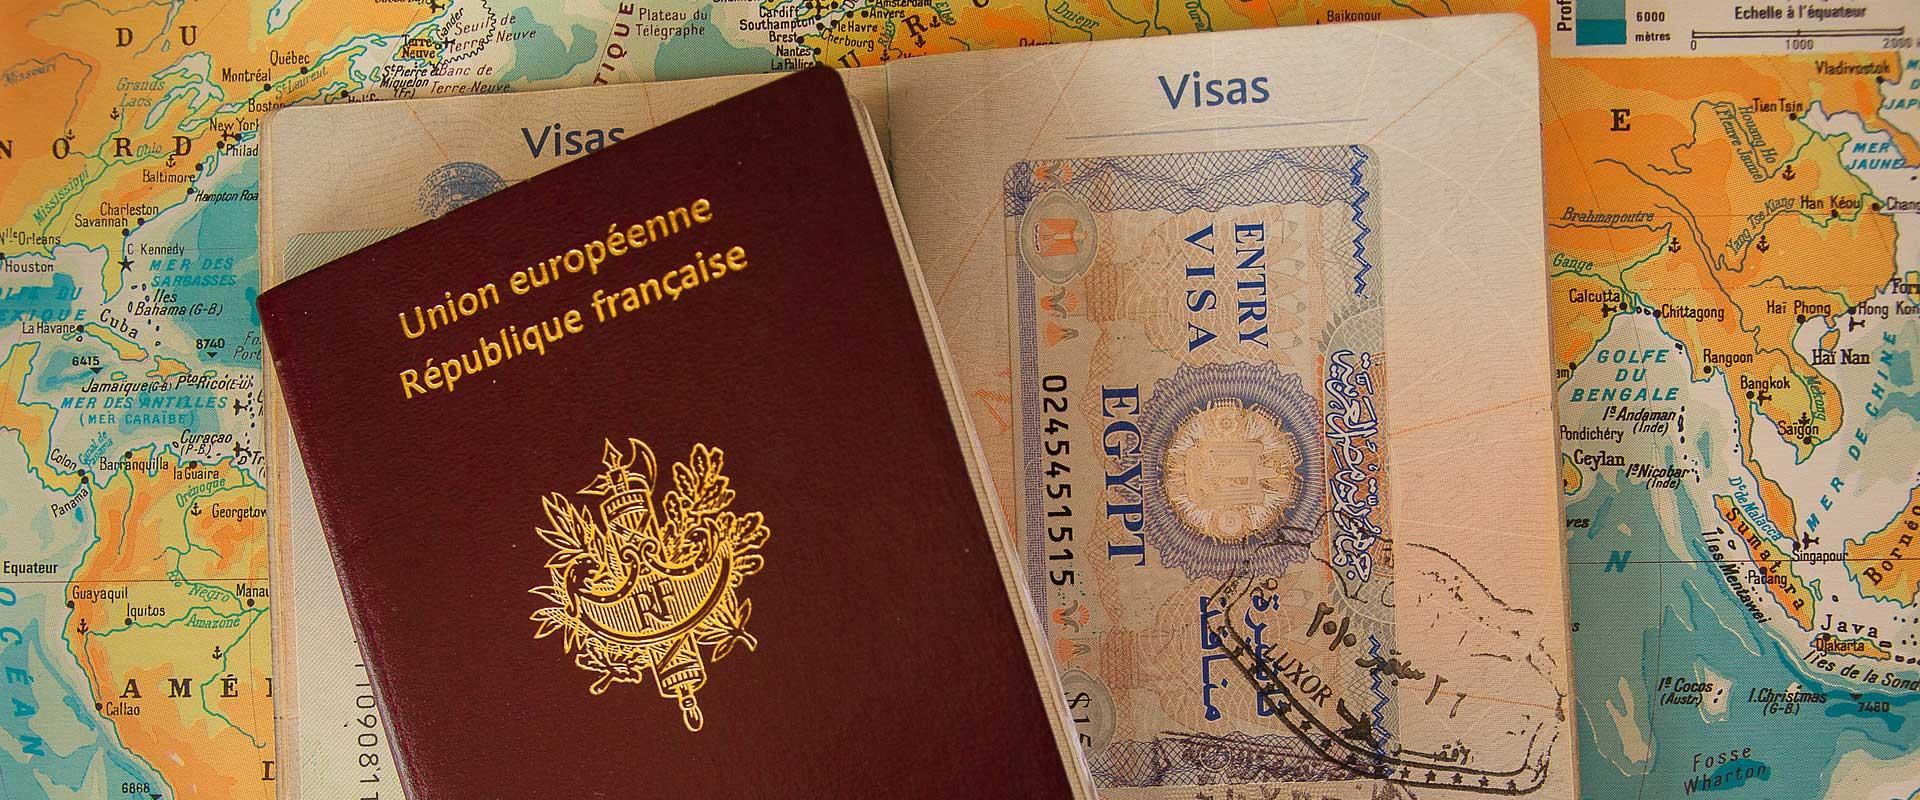 Passeport, visa et carte du monde